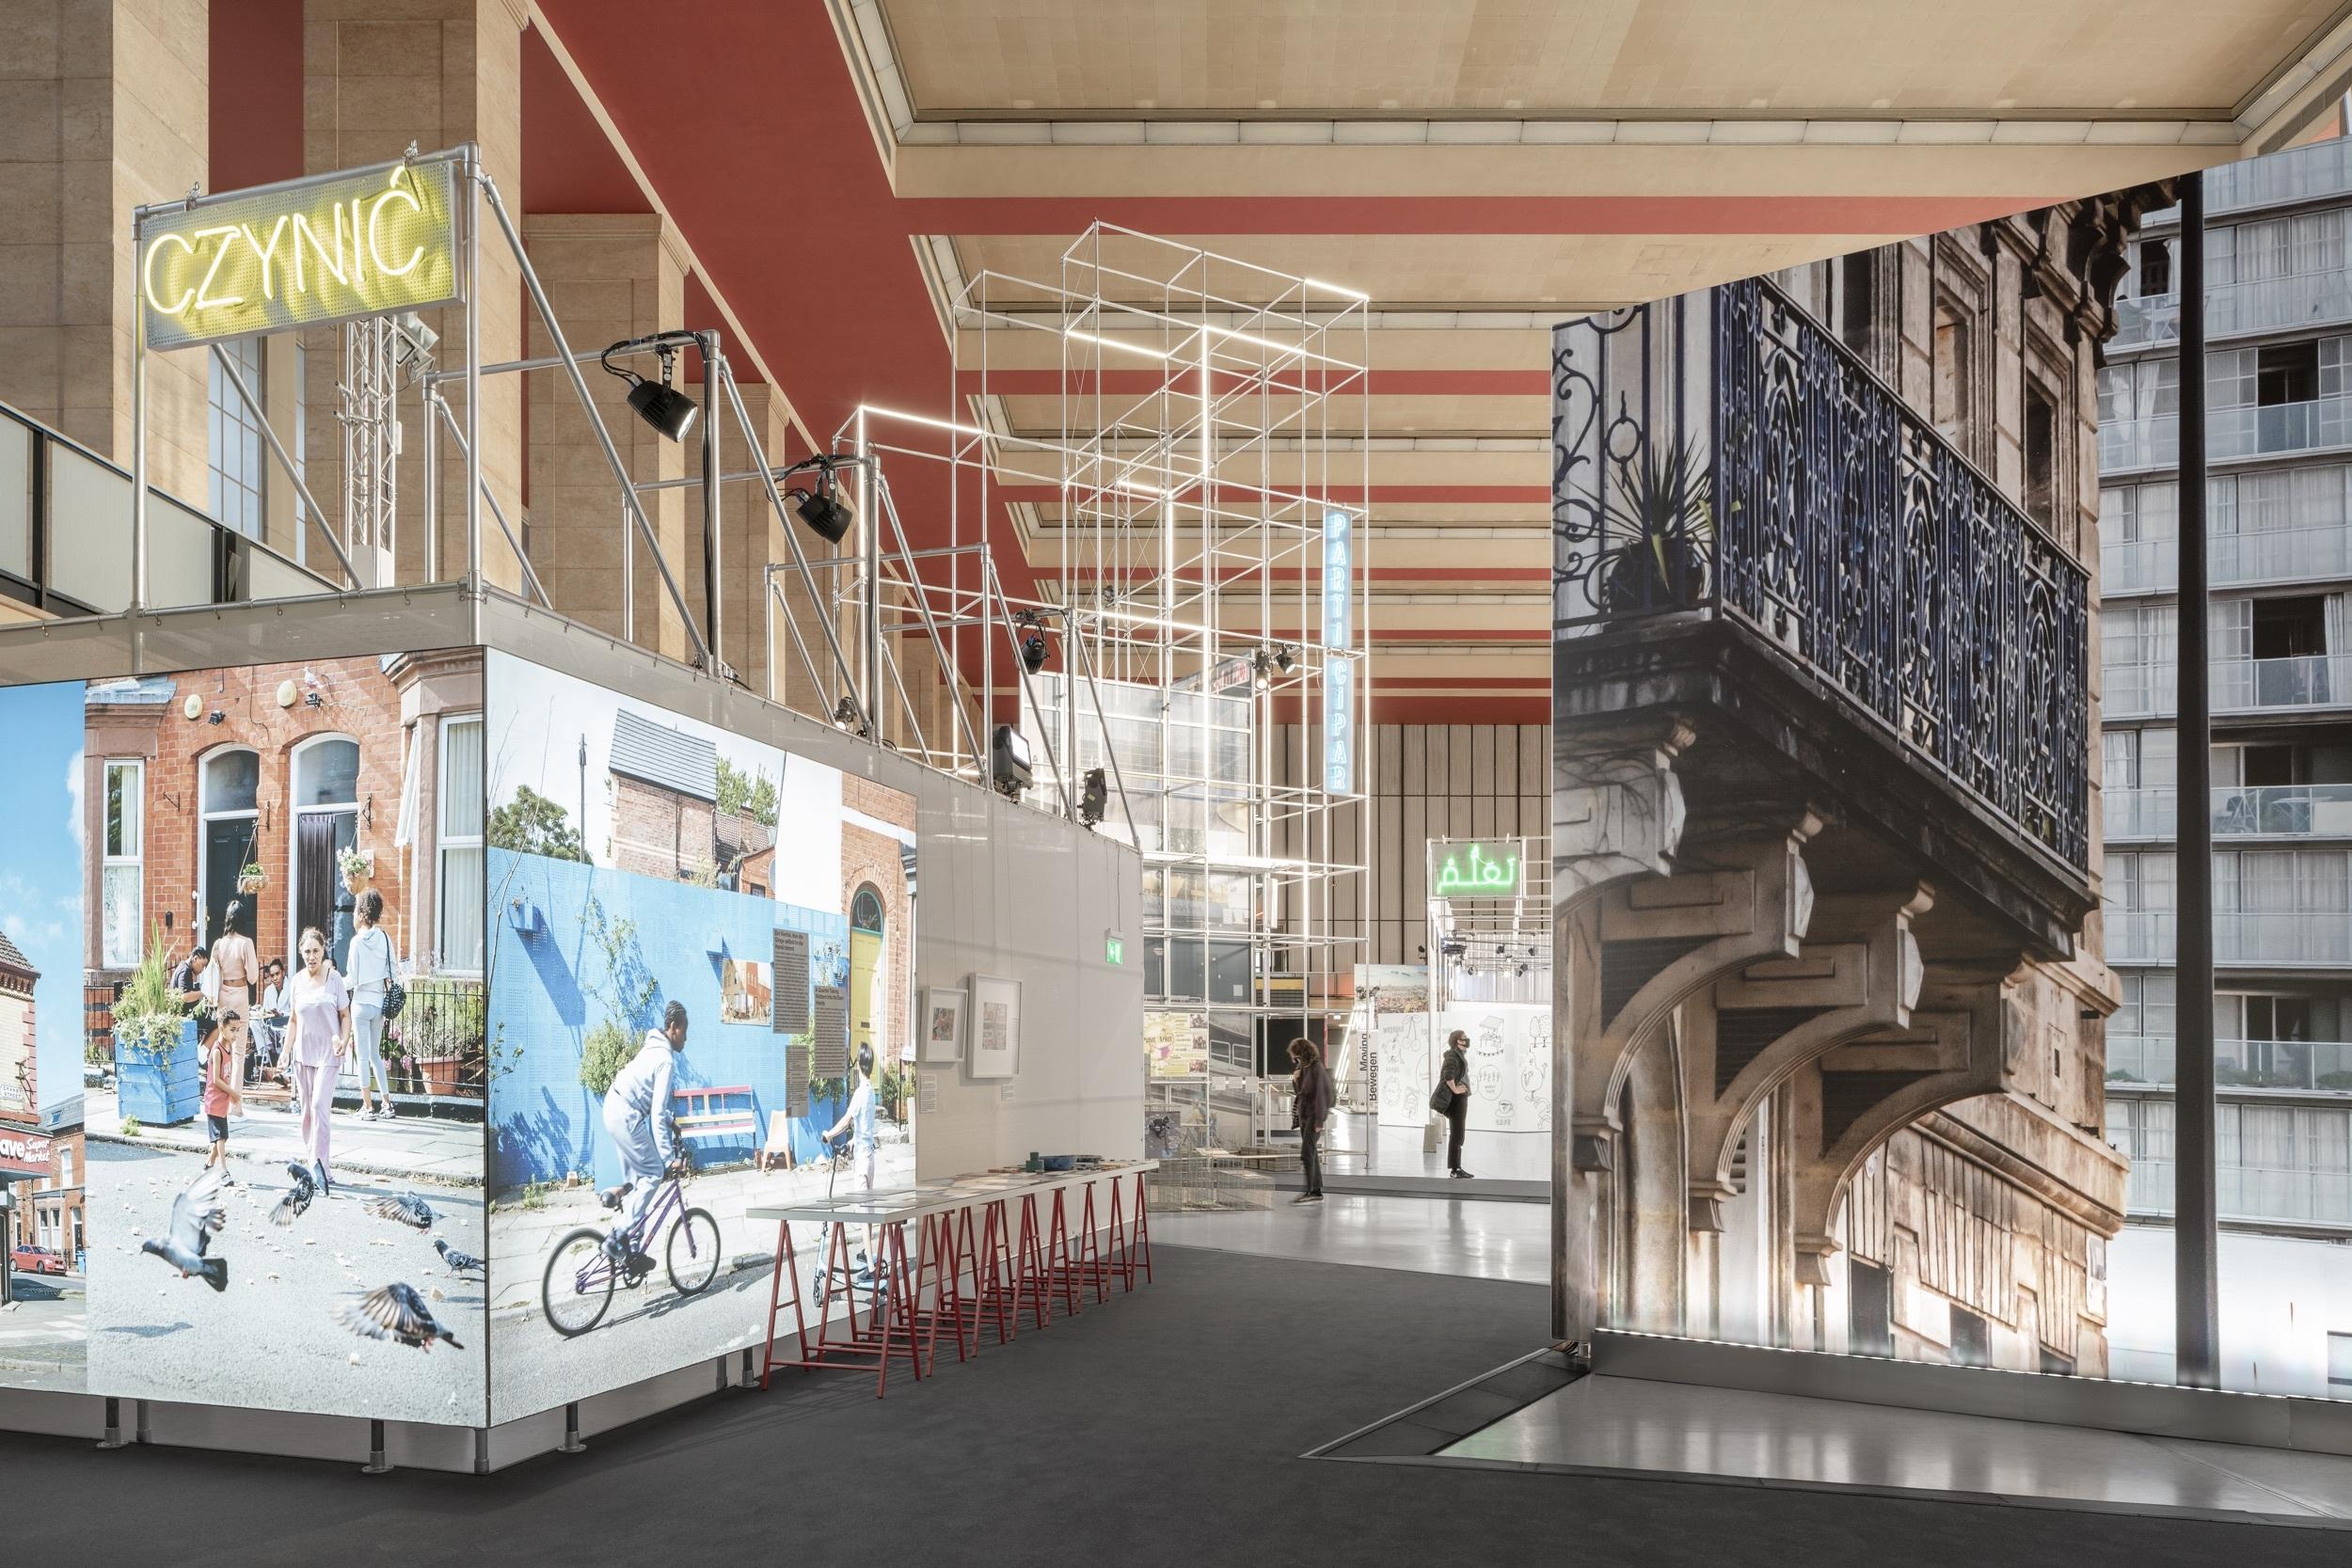 Living the City Exhibition View 0503 c Schnepp Renou 2020